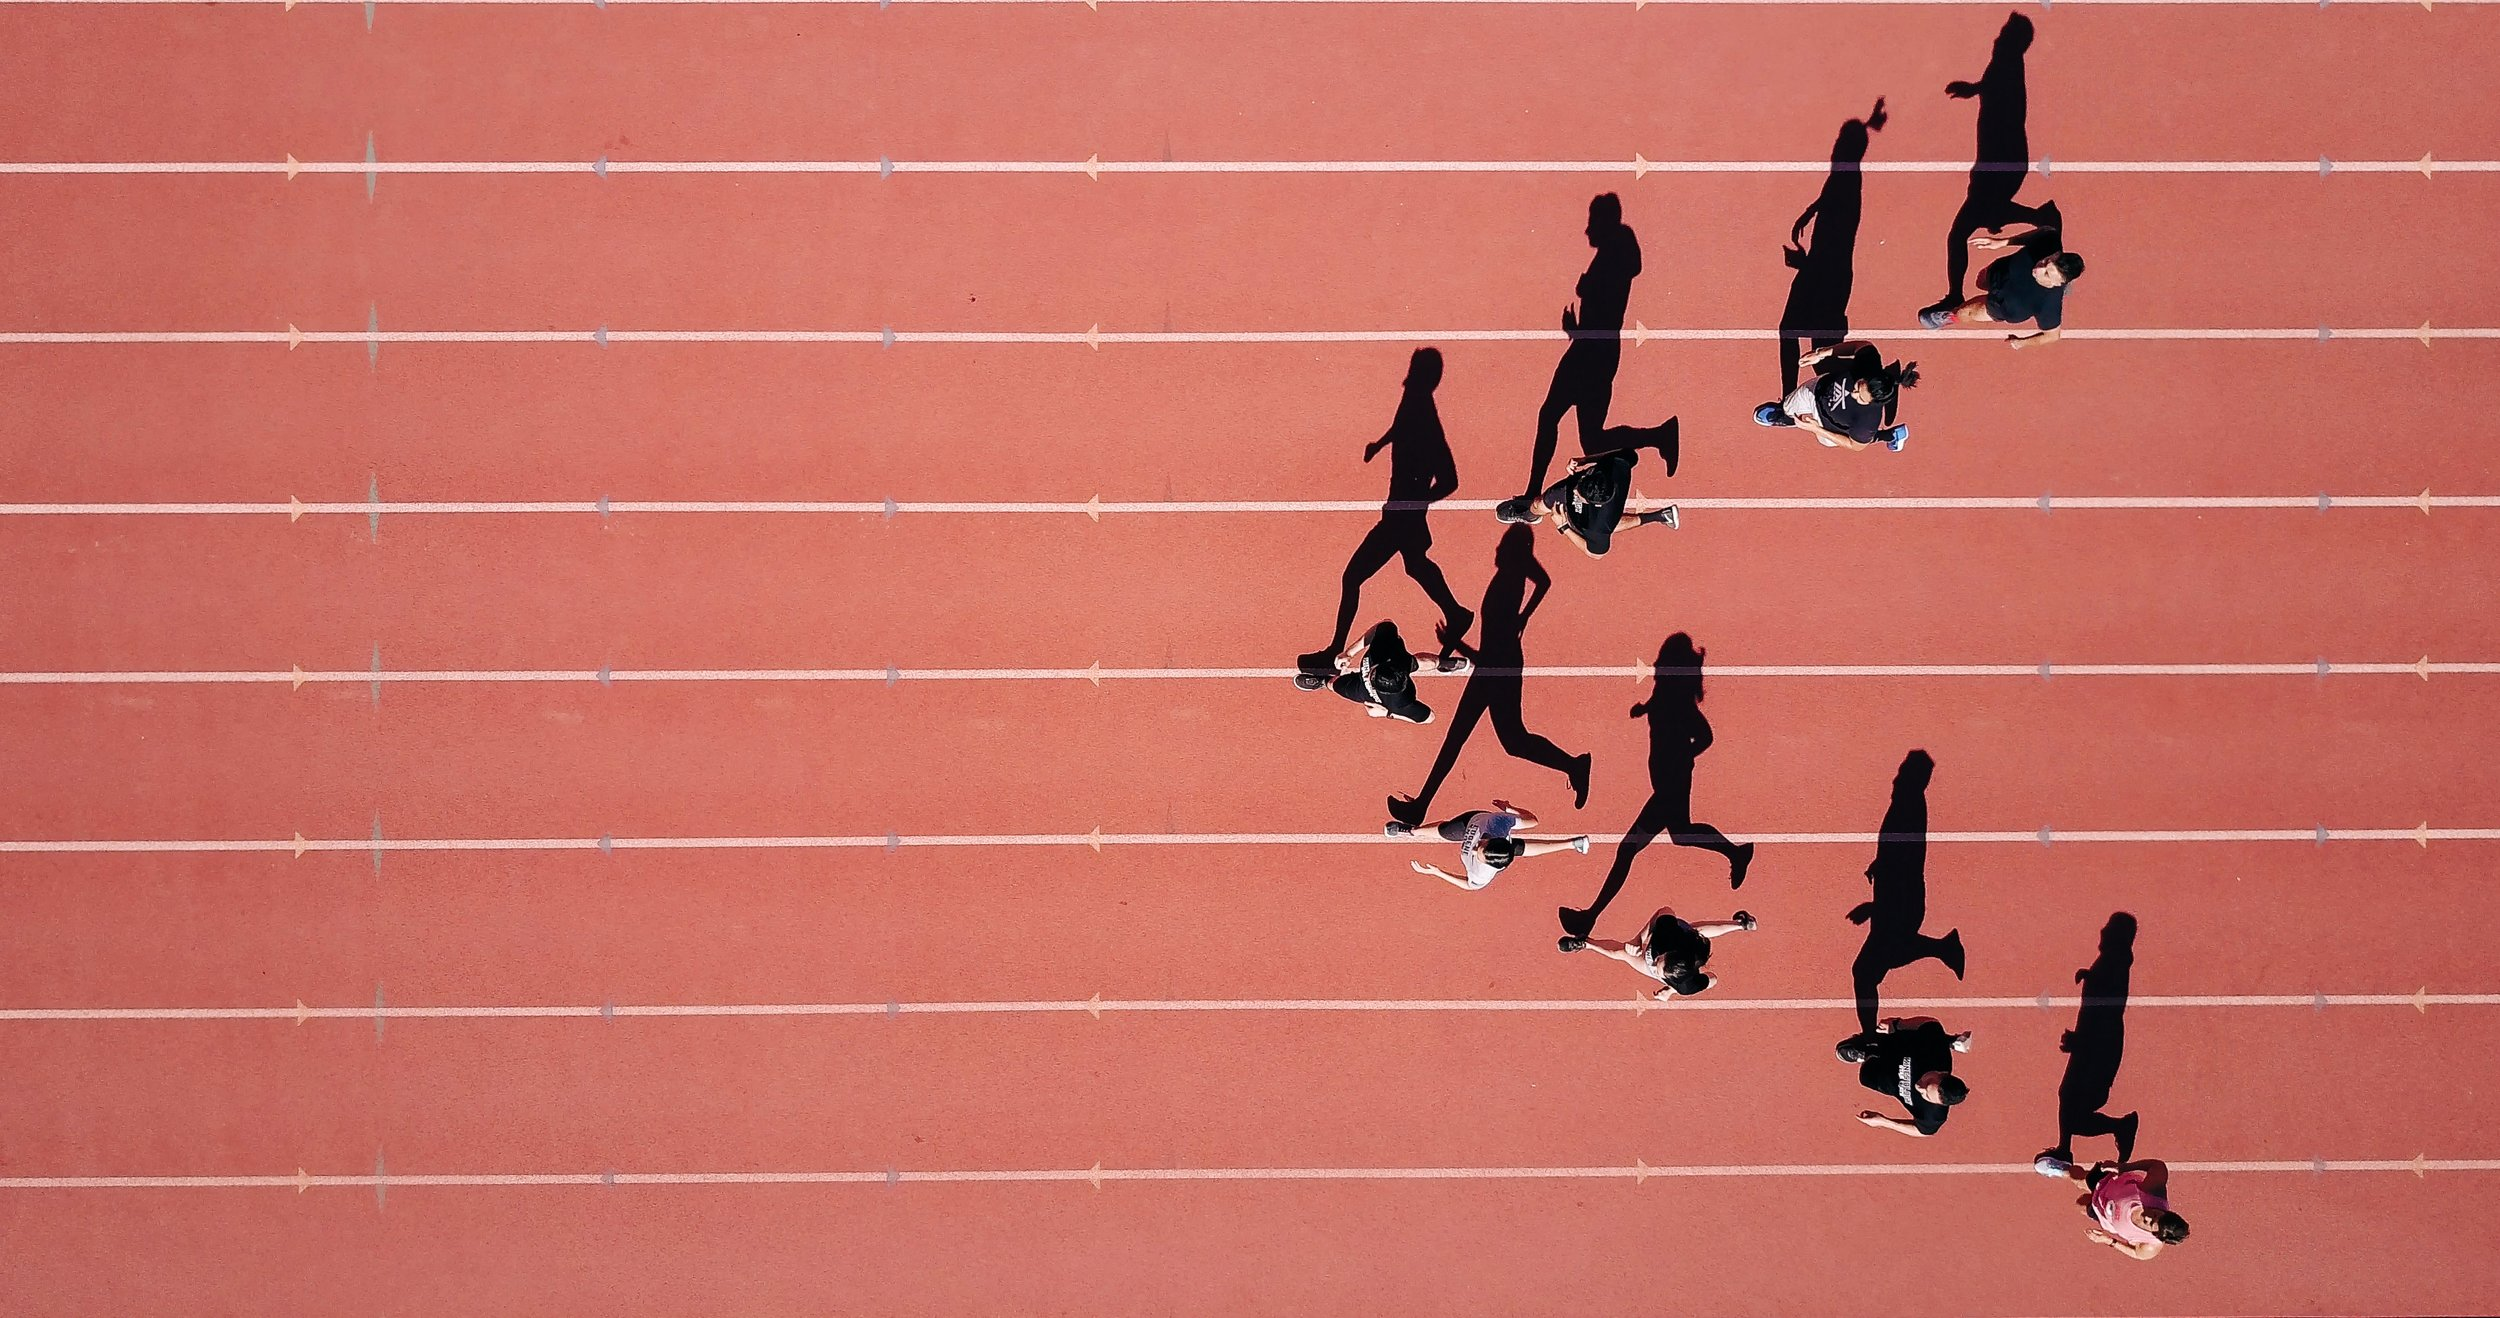 Sprinters on track